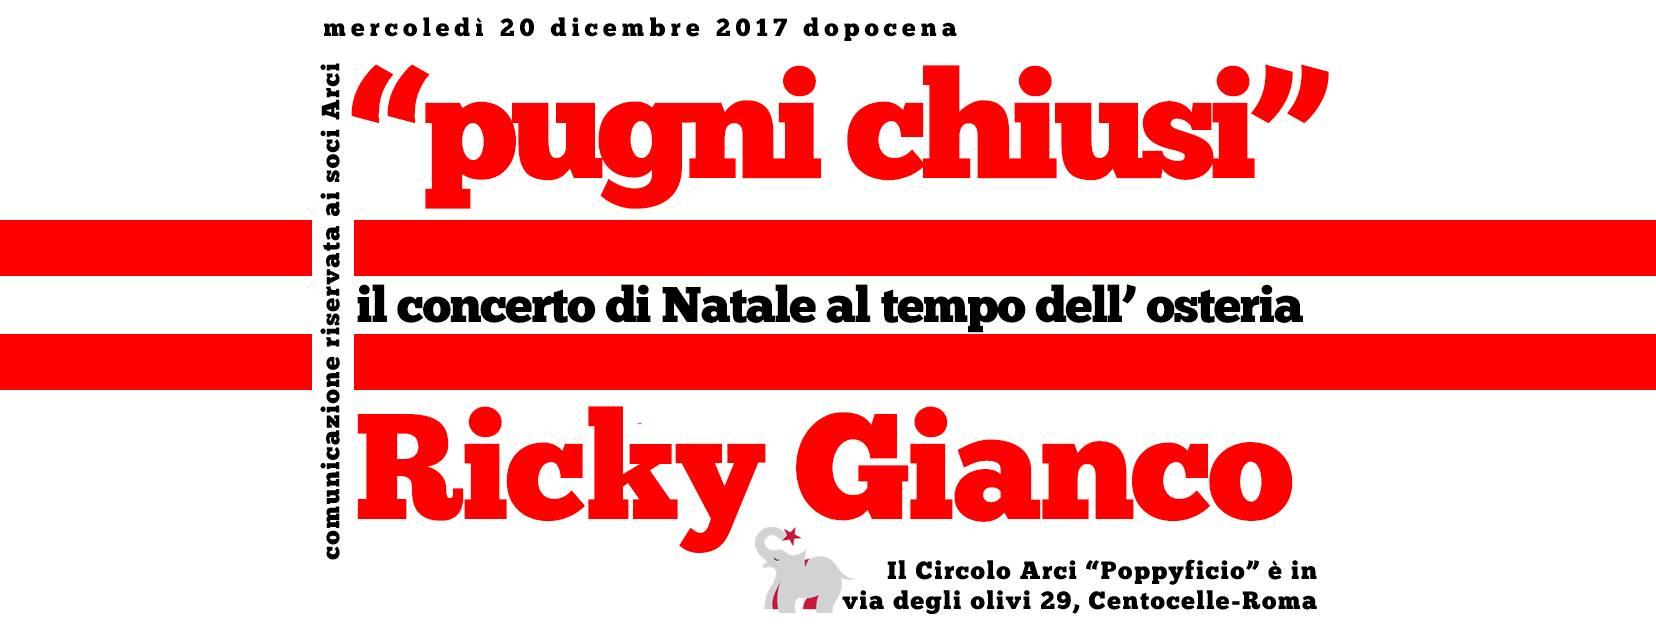 Locandina Ricky Gianco Roma 20.12.2017